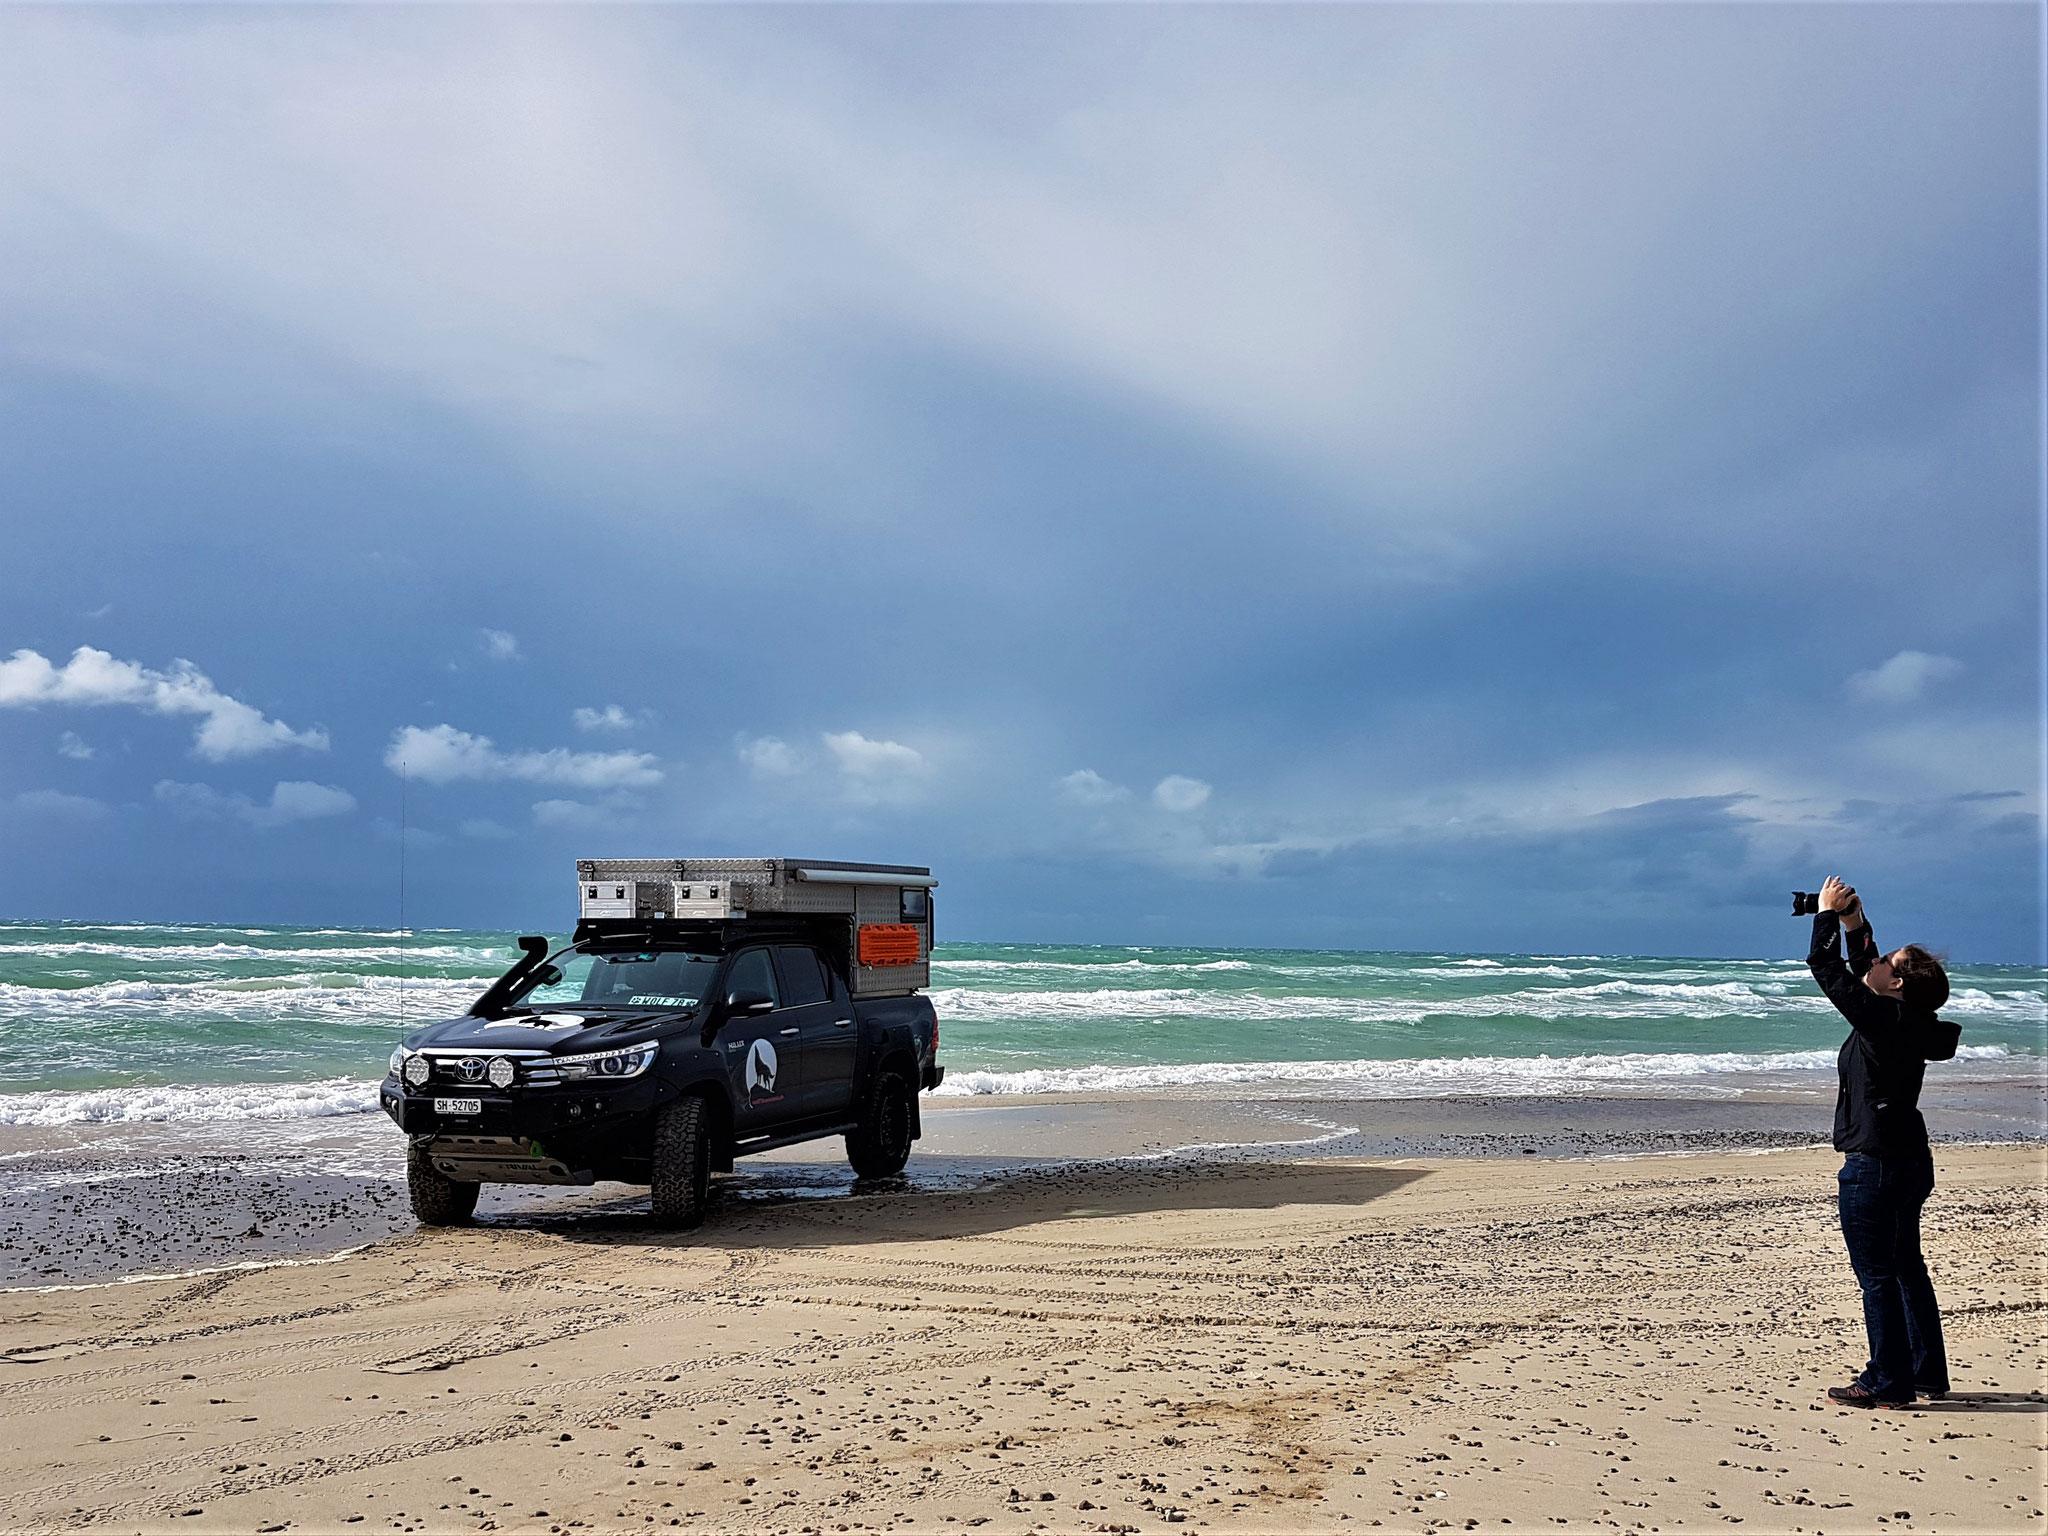 Dänemark Pickup-camper Strand befahrbar Foto Shooting Toyota Hilux Arctic Trucks Skandinavien #ProjektBlackwolf wolf78 explore without no limits offroad overland Travel Camping 4x4 AFN4x4 frontrunneroutfitters #BornToRoam Rival4x4 wolf78-overland.ch